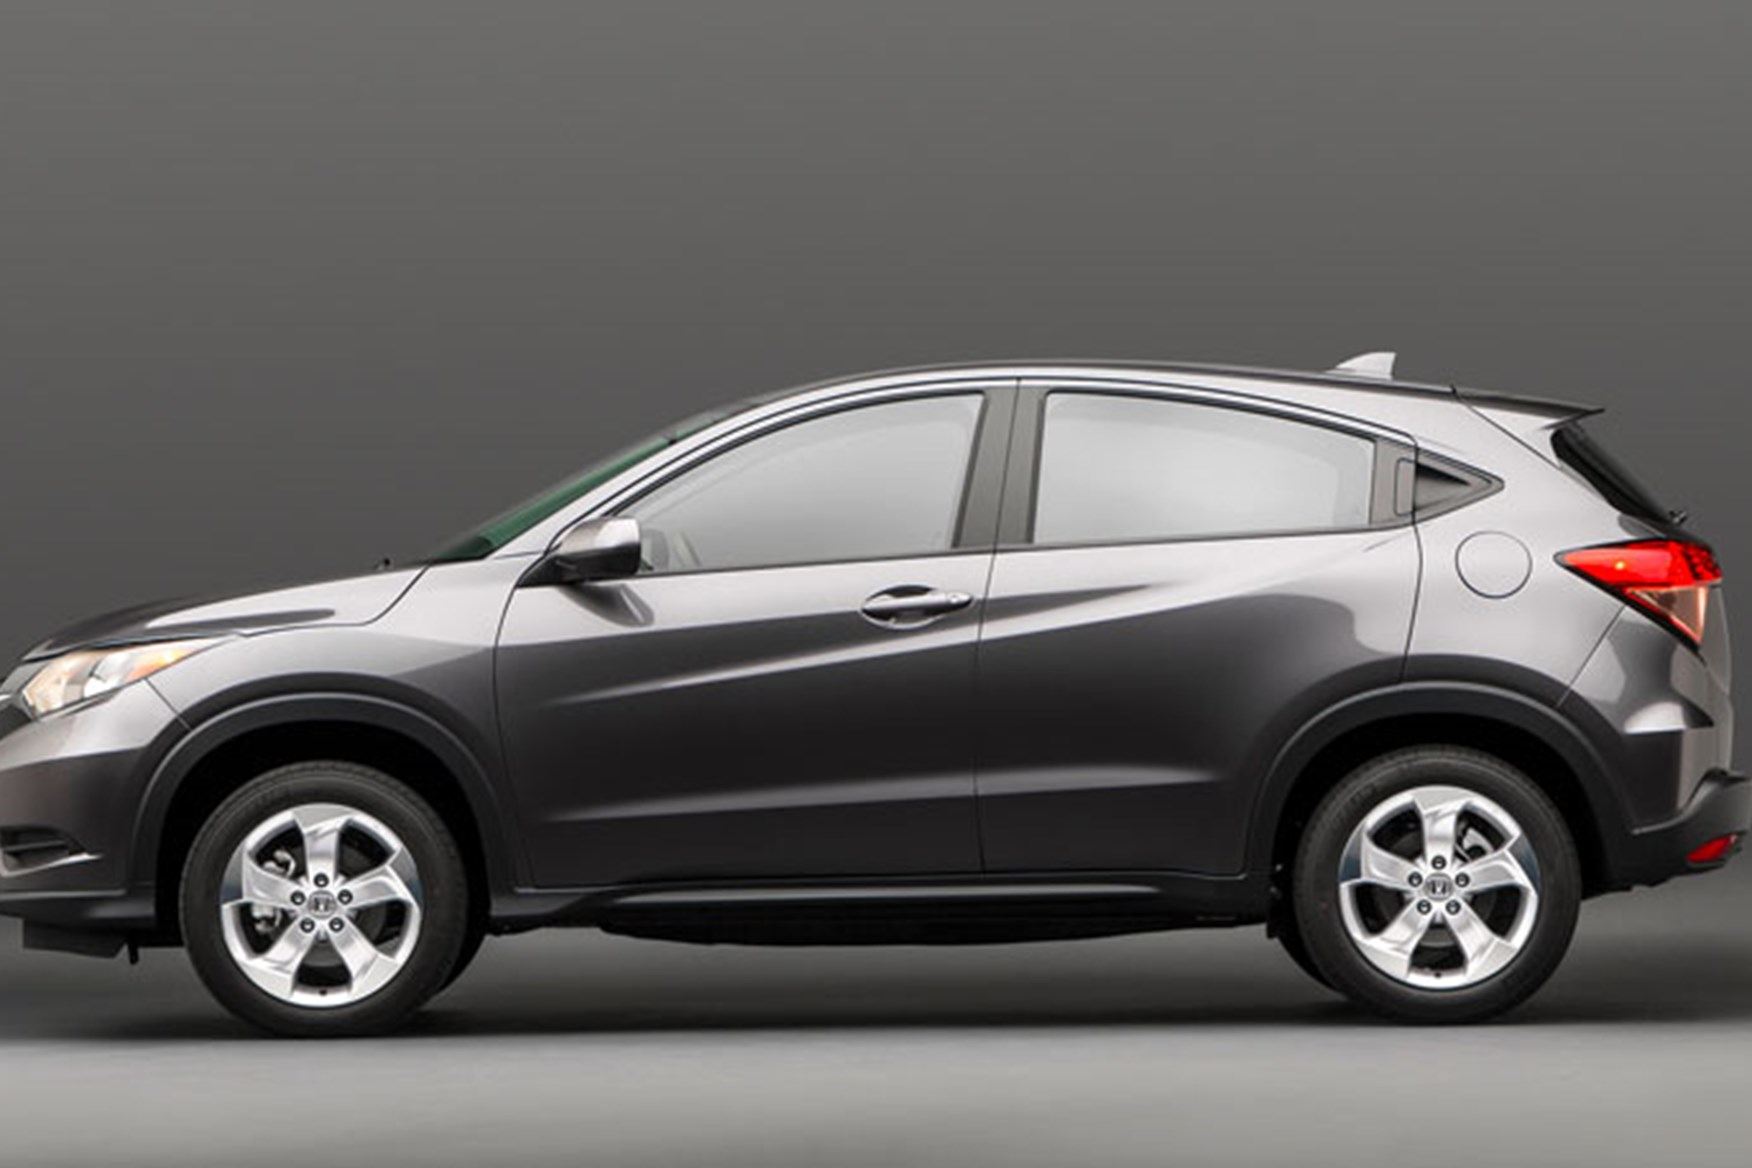 Marvelous ... Honda HR V (2015) First Official Pictures ...